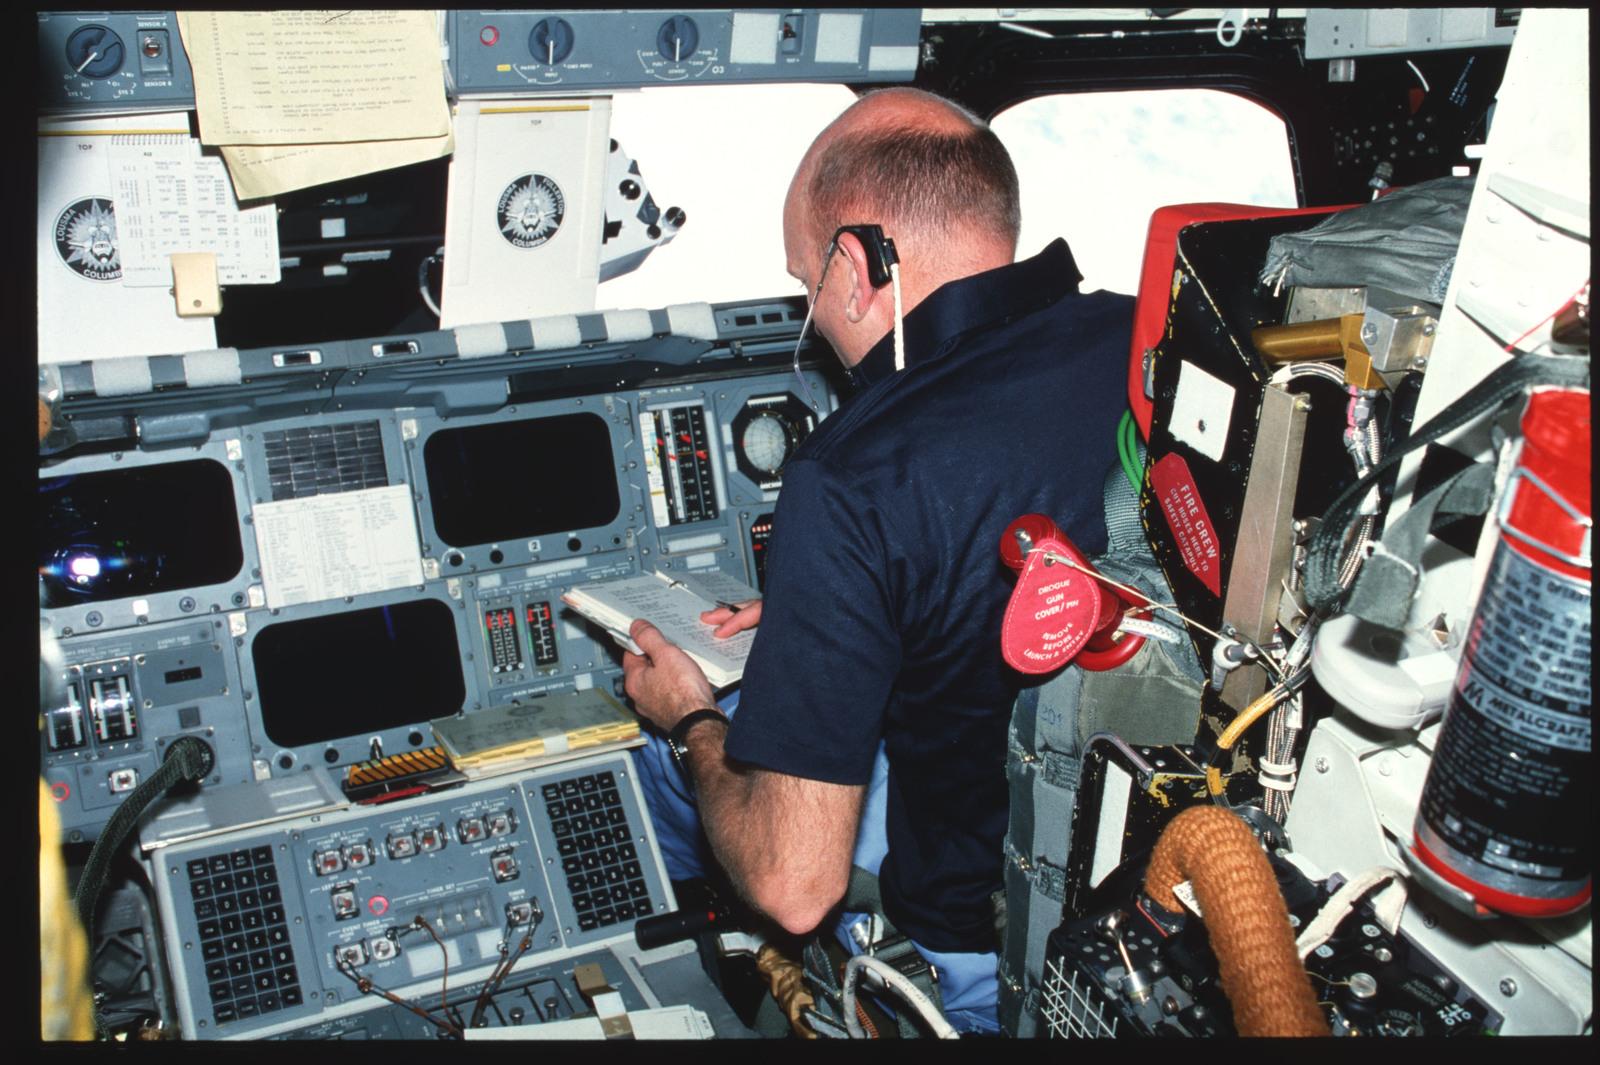 S03-22-130 - STS-003 - Pilot Fullerton reviews FDF checklist at forward flight deck pilots station